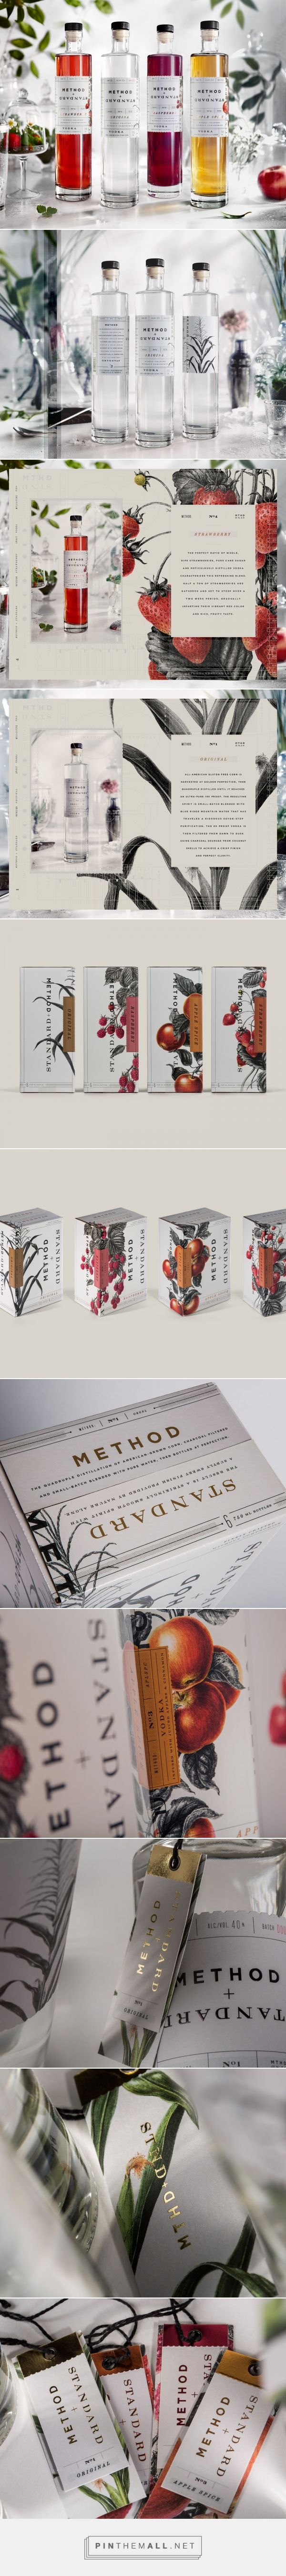 Method + Standard Vodka by Device Creative Collaborative